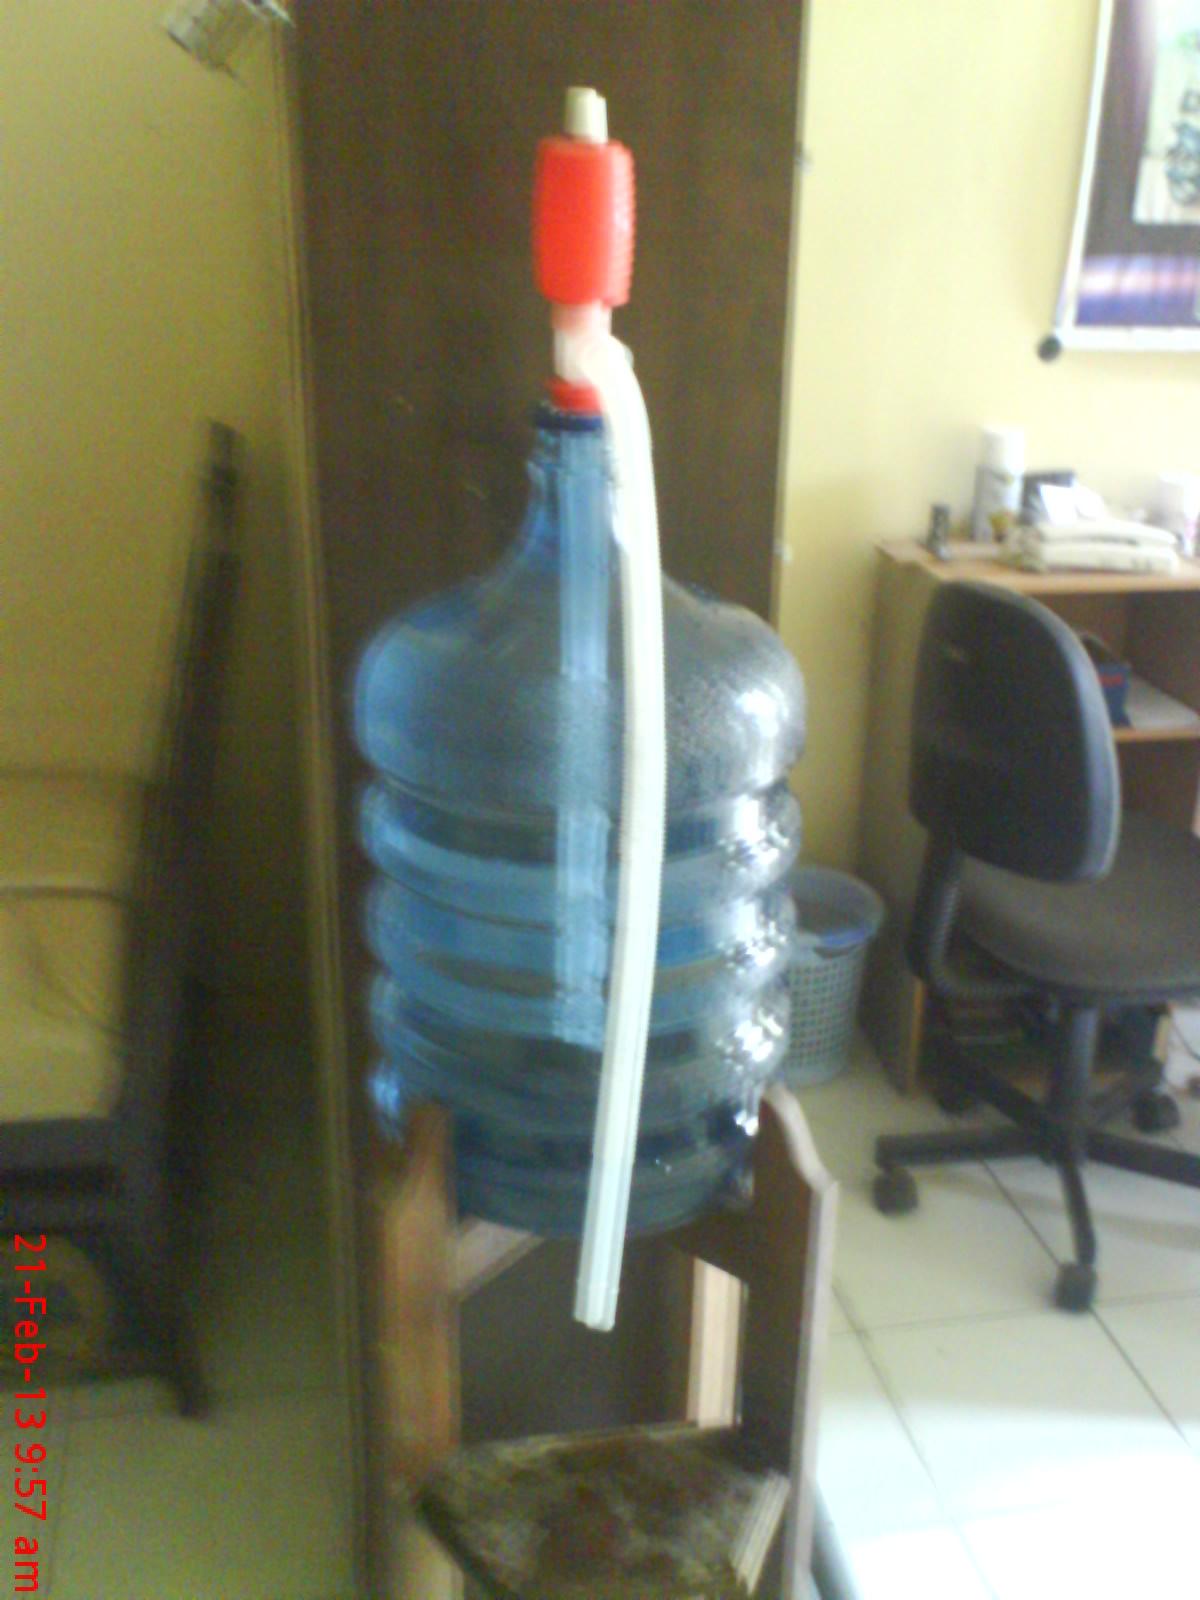 Tips Cara Menaruh Galon Air Yang Praktis Hariyanto Imadha Blog Motivasi Tip Trik Dan Kreativitas